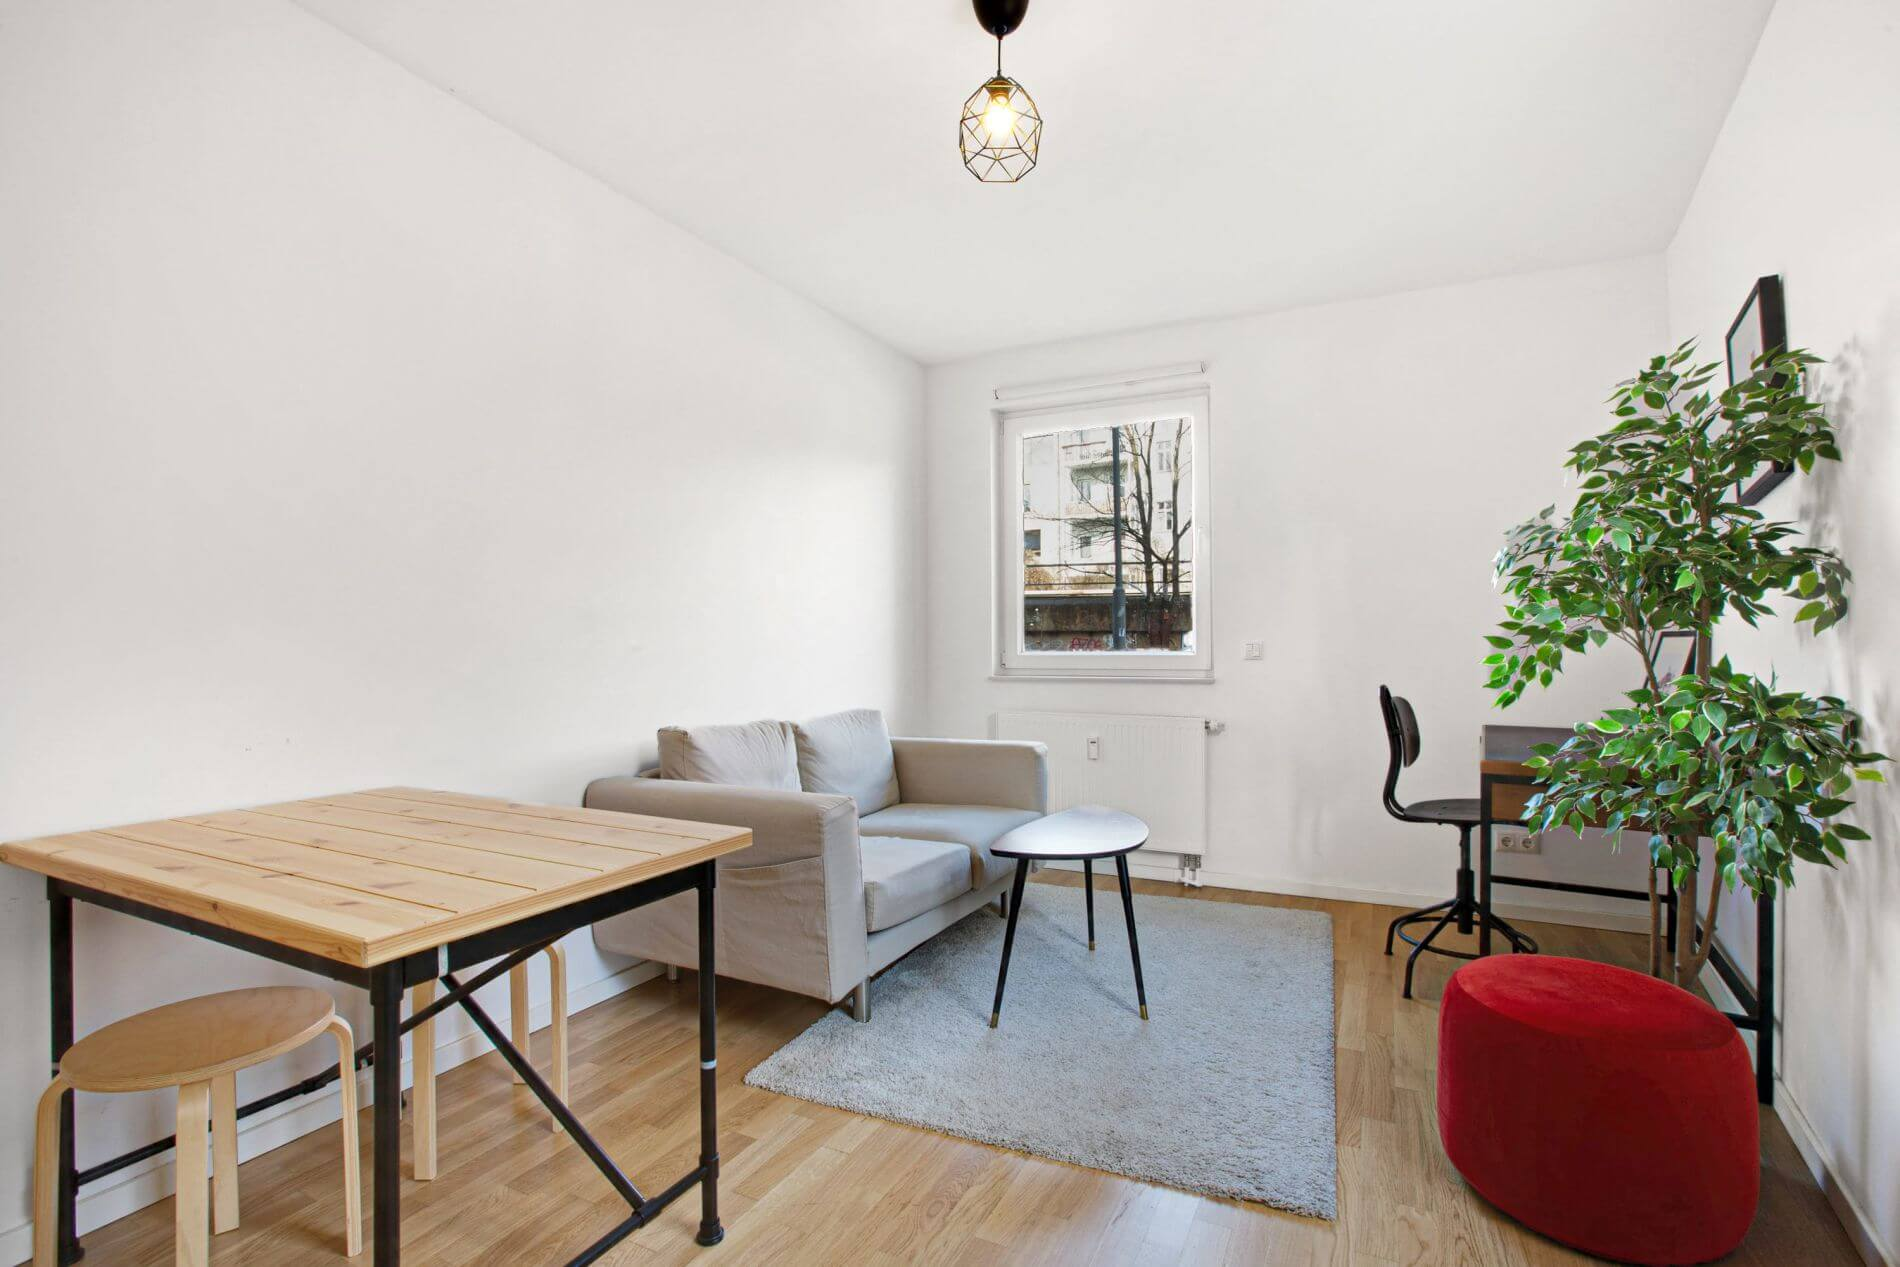 1 bedroom serviced apartment in Ostkreuz, Berlin for long term stays